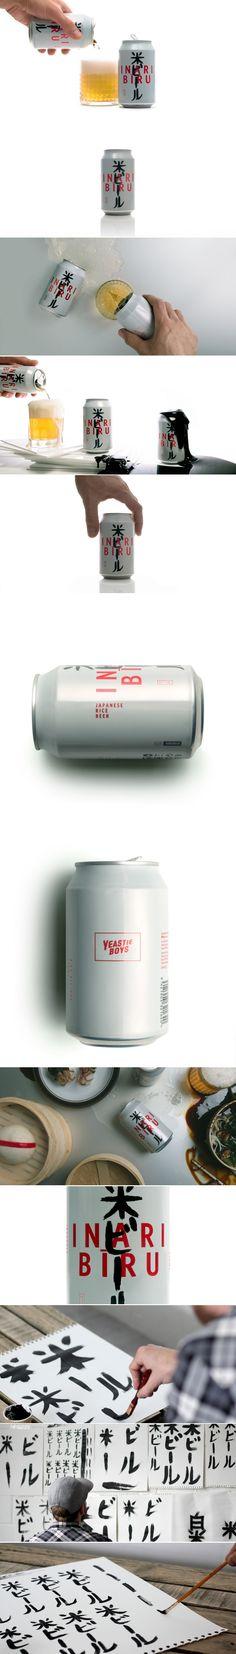 Inari Biru Is Inspired By Minimalist Japanese Design and Calligraphy — The Dieline | Packaging & Branding Design & Innovation News Beer Packaging, Beverage Packaging, Innovation News, Web Magazine, Japanese Design, Bottle Design, Package Design, Branding Design, Bottles